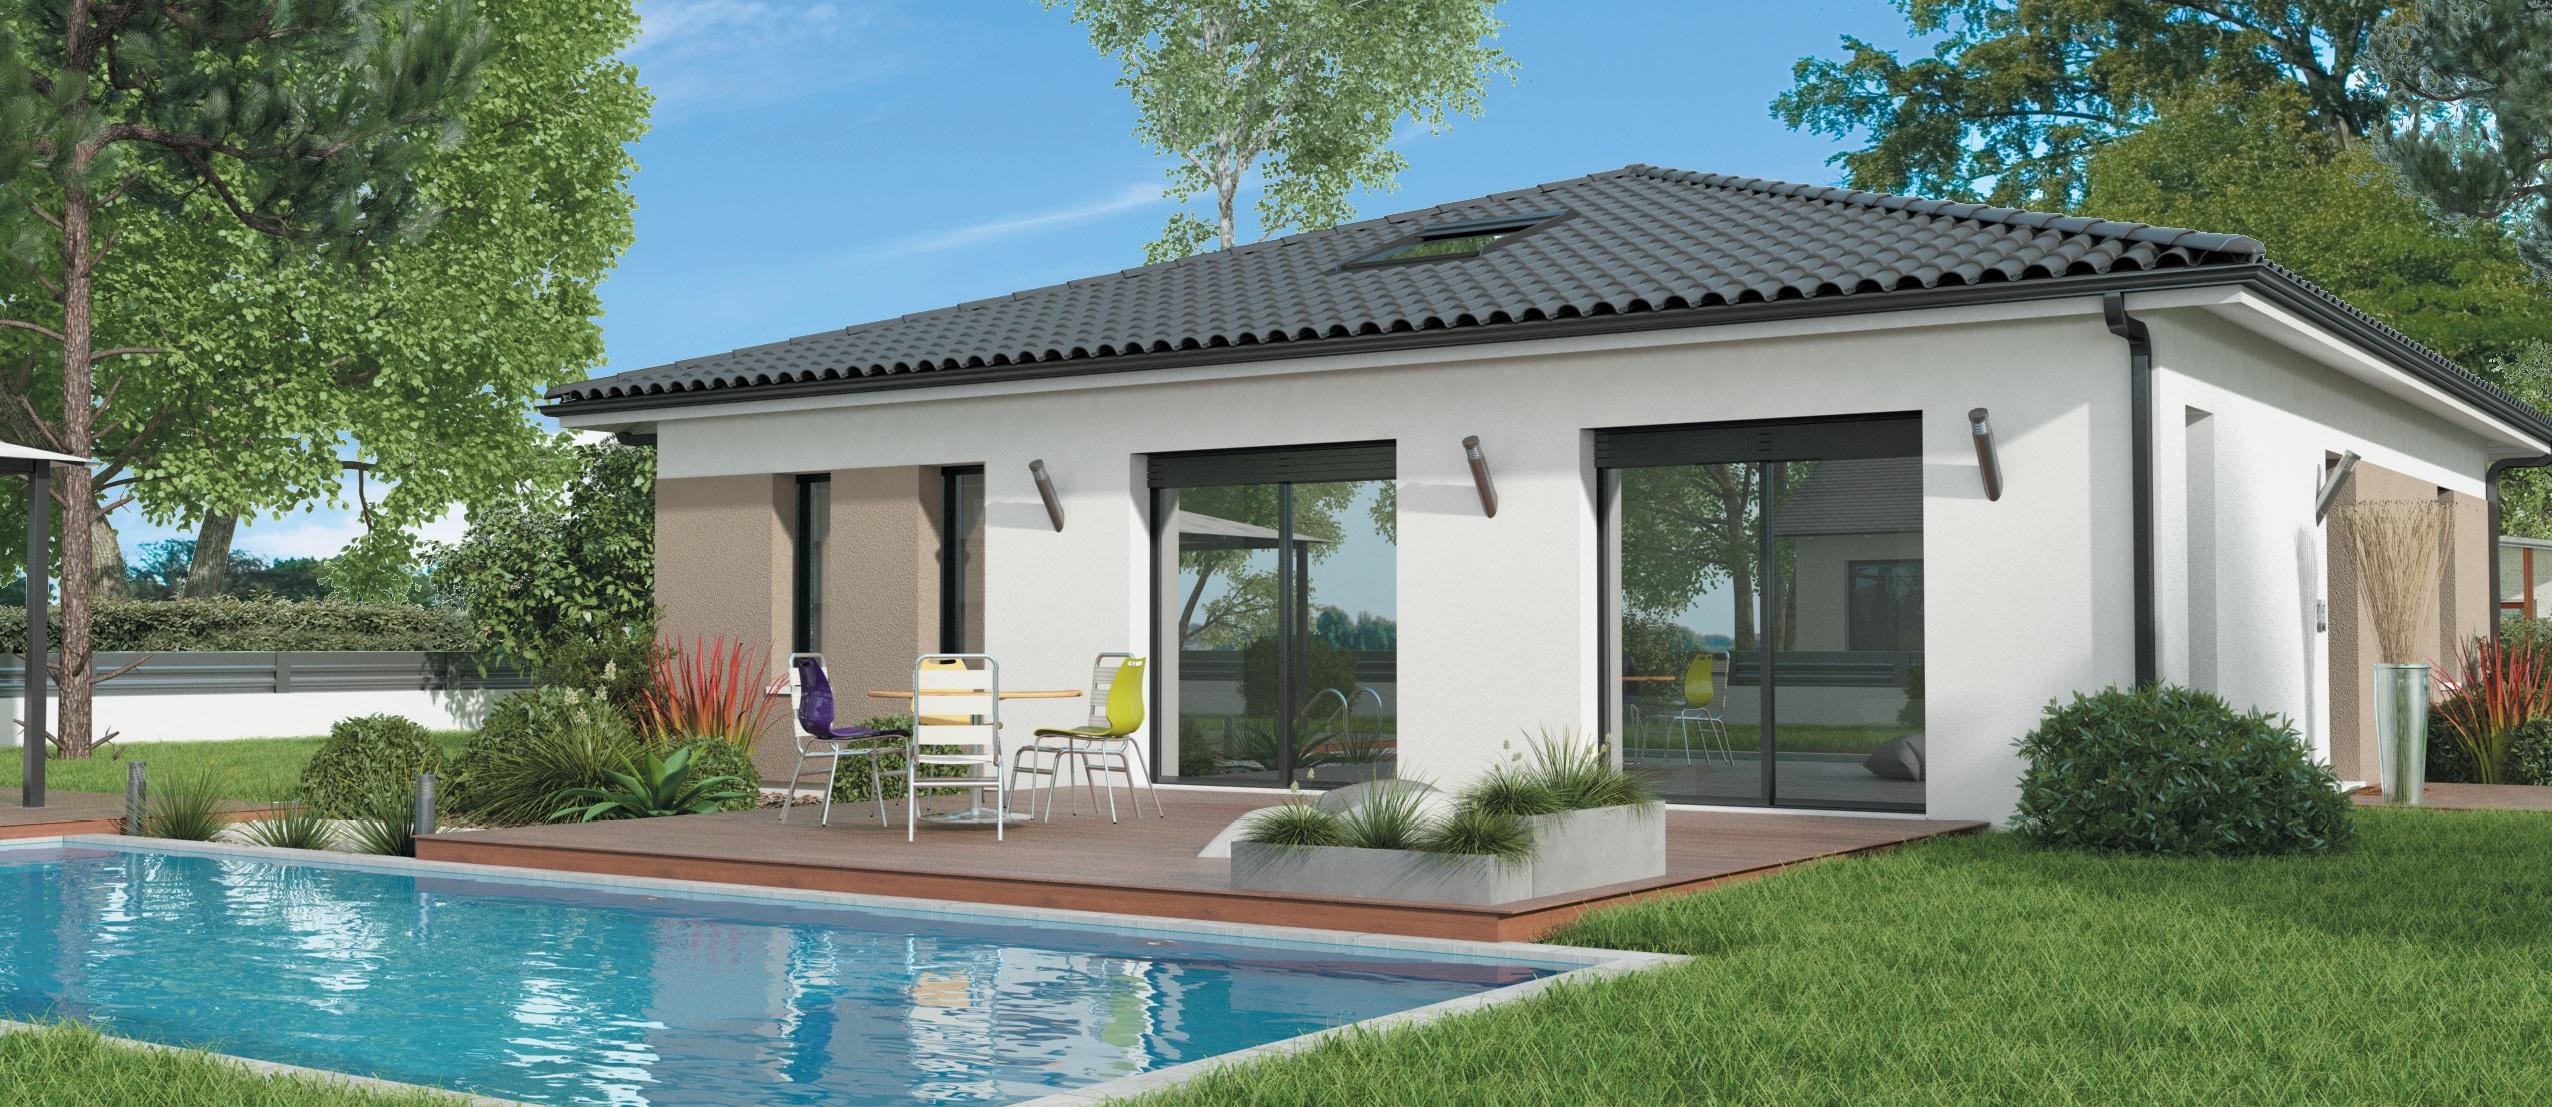 maison verte construction horizontale